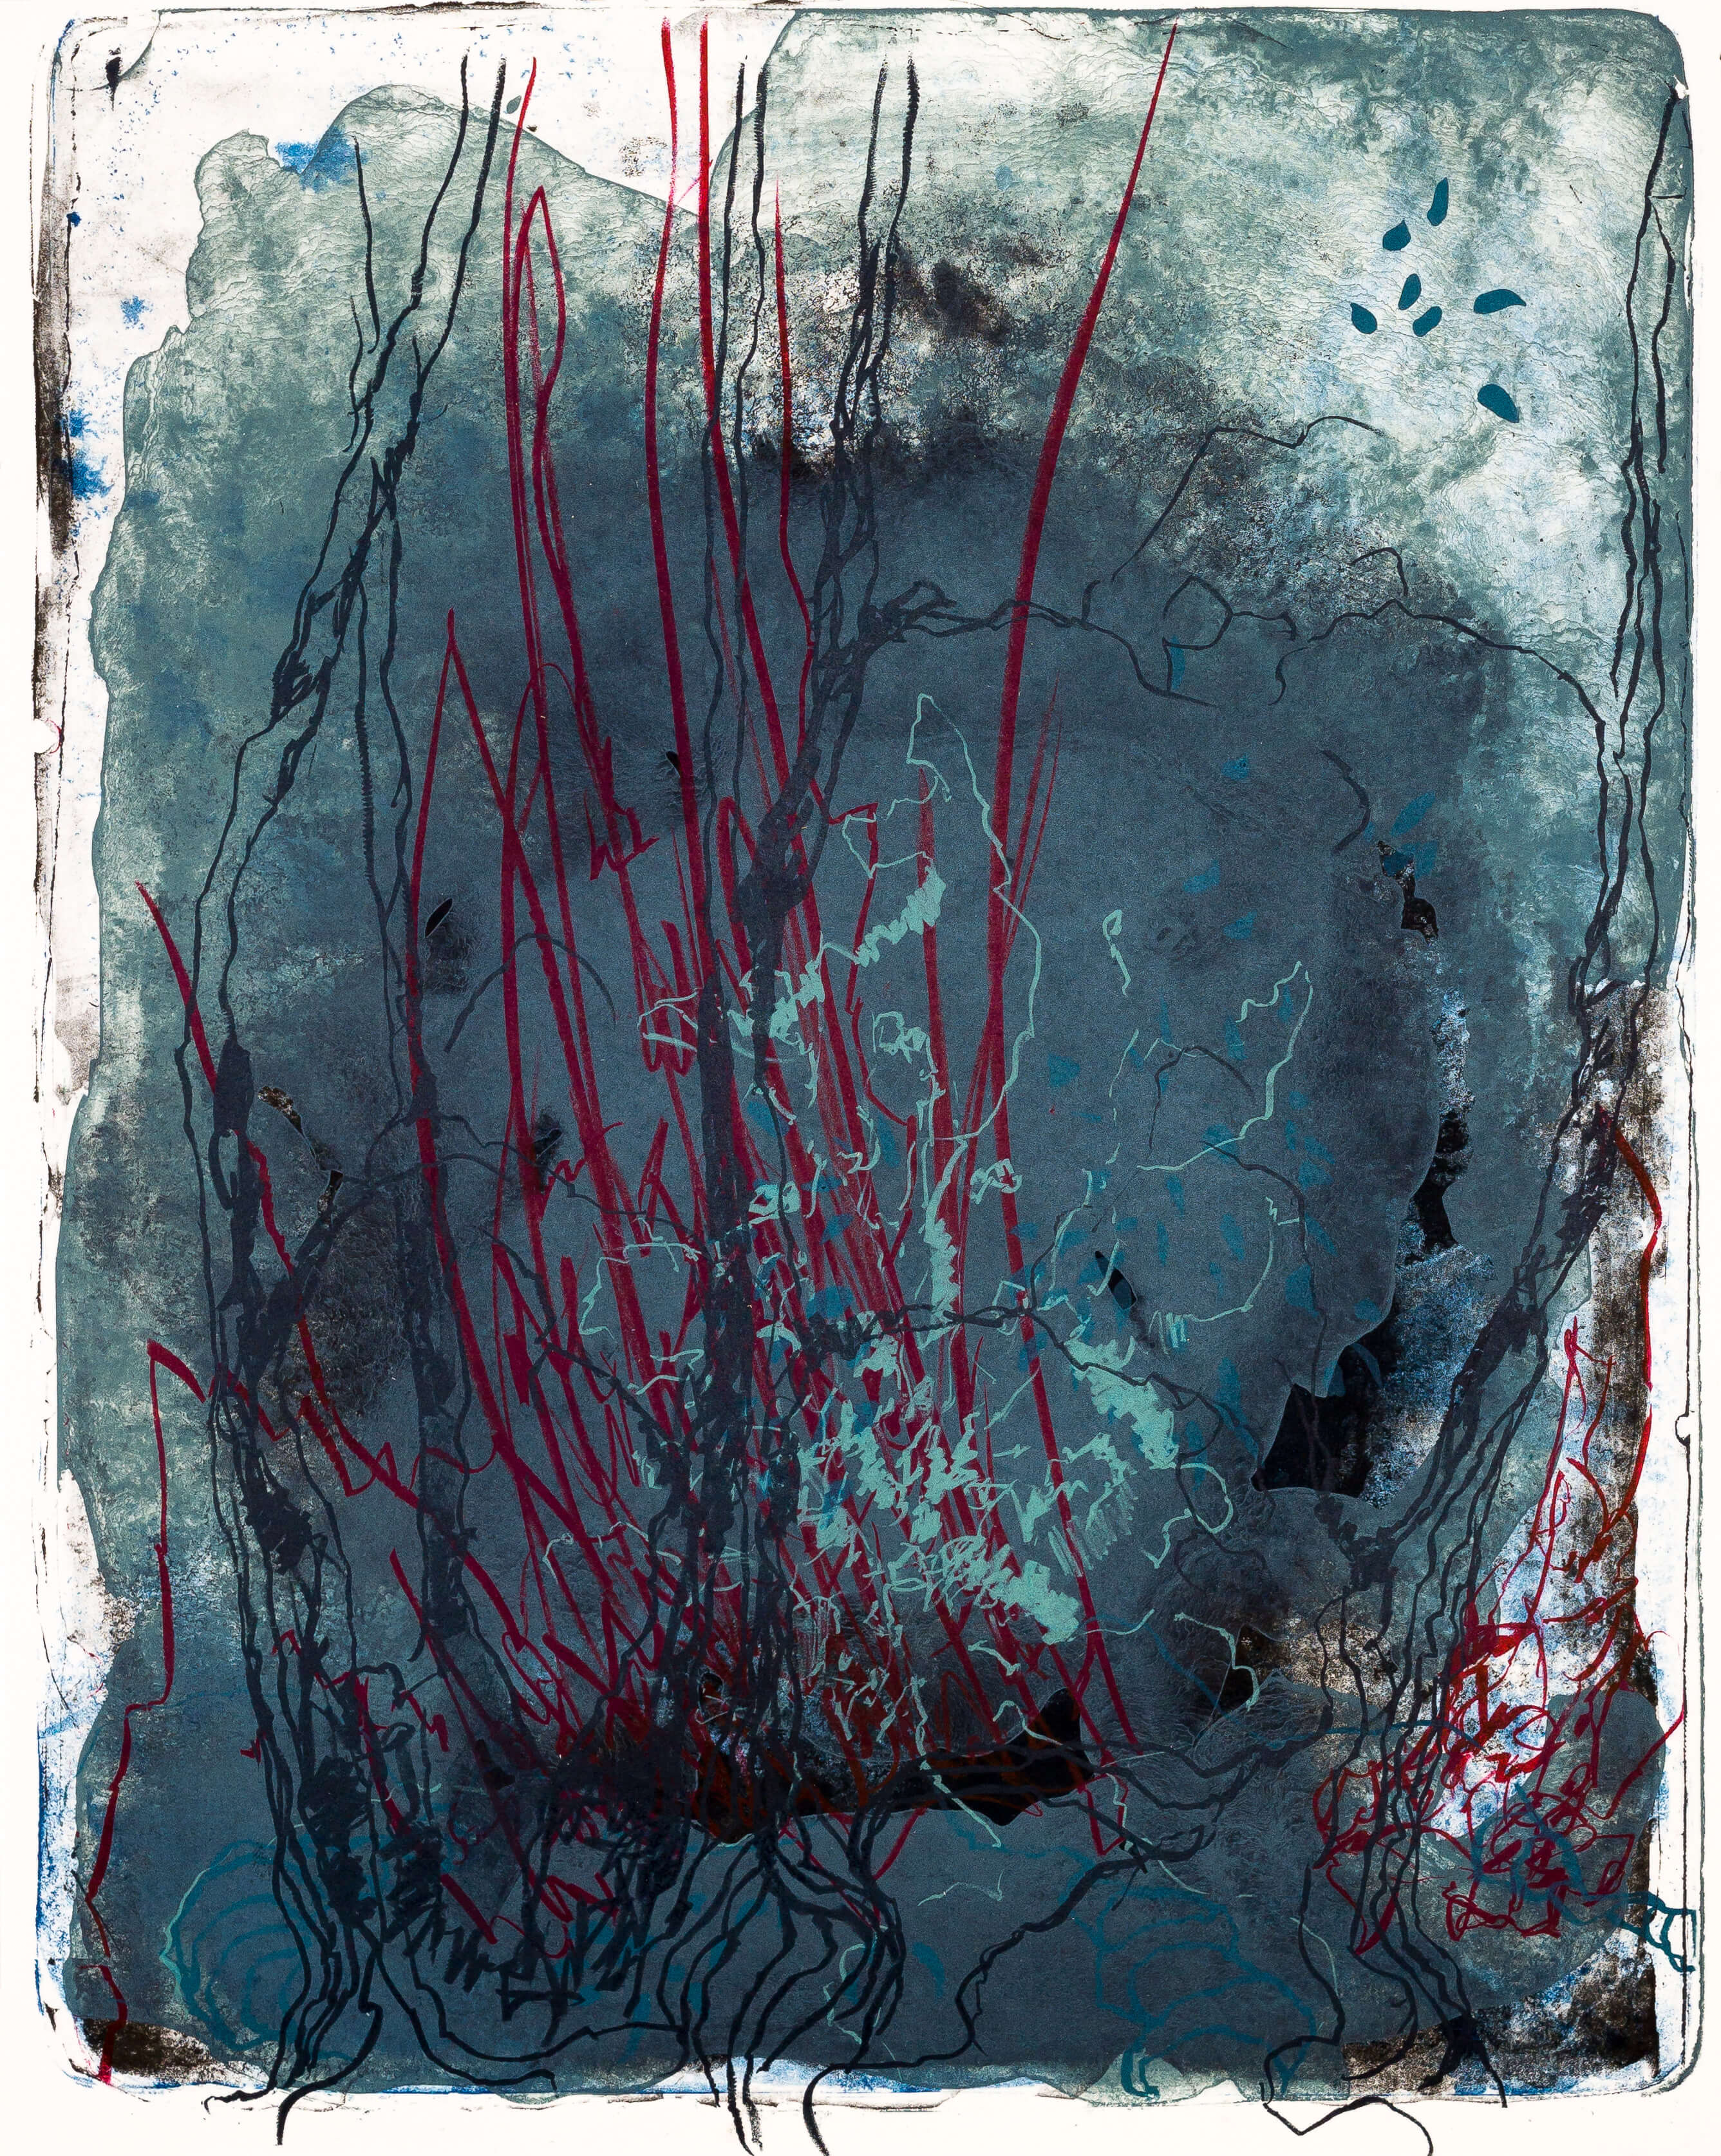 Katharina Albers, organism (Wald) I, 2016, Farblithographie, Unikat, 50x40 cm